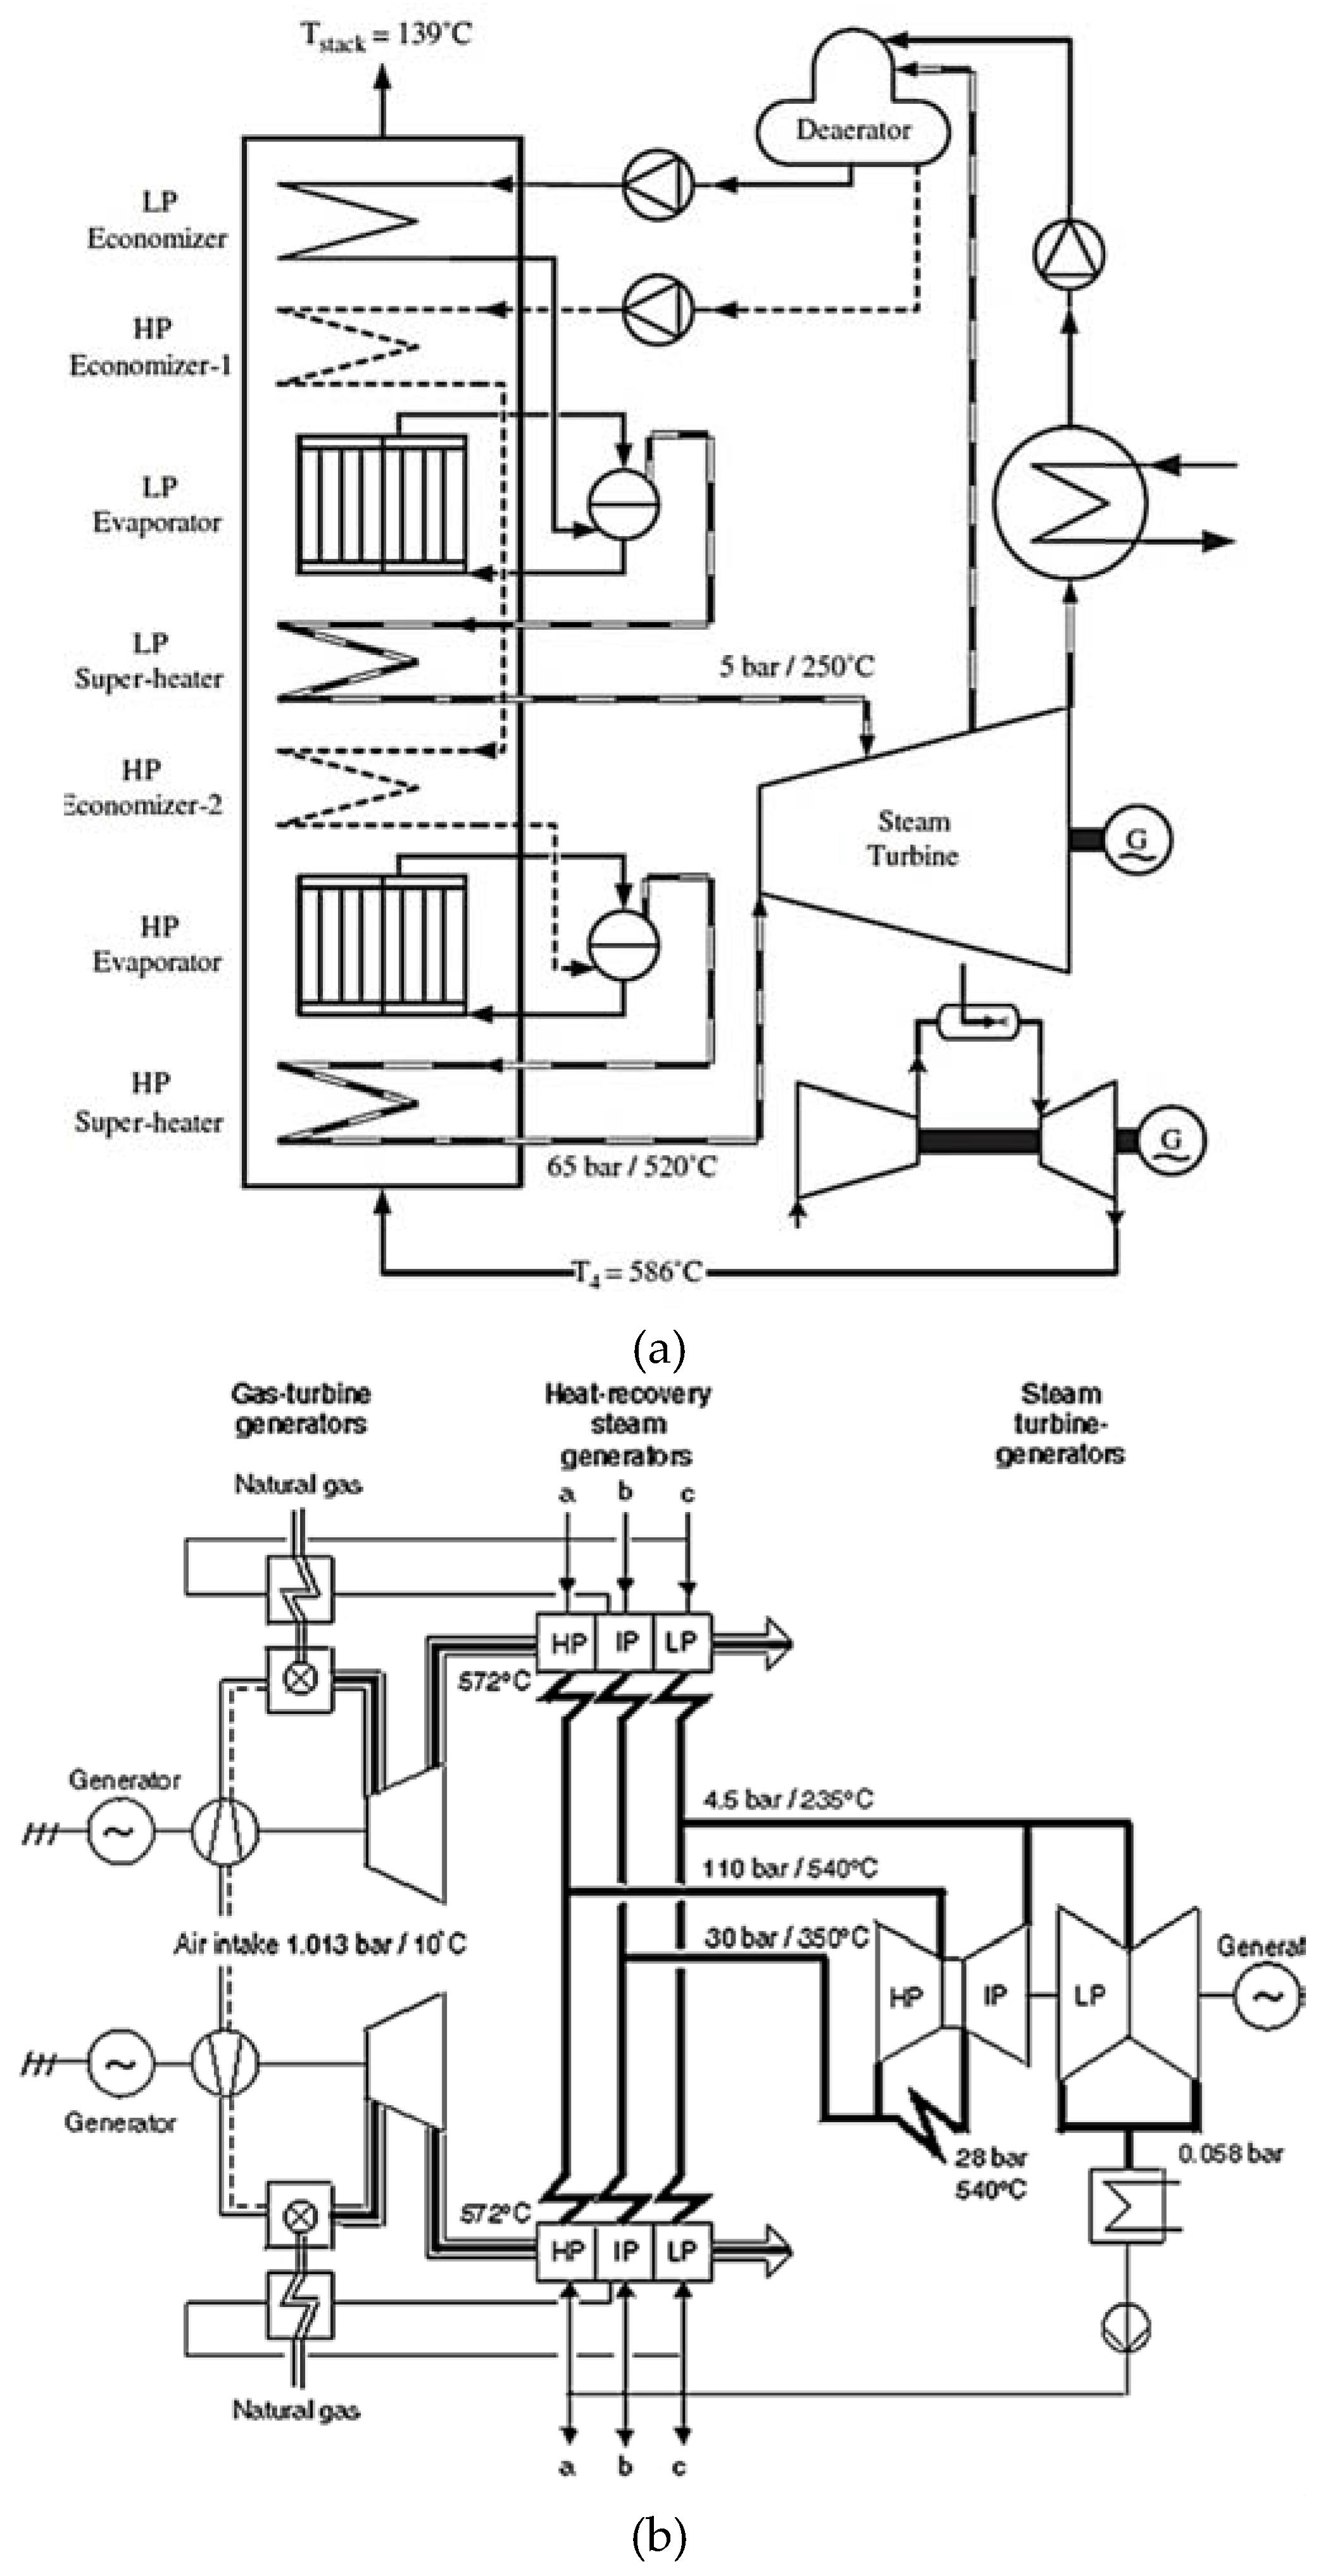 Cogeneration Power Desalting Plants Using Gas Turbine